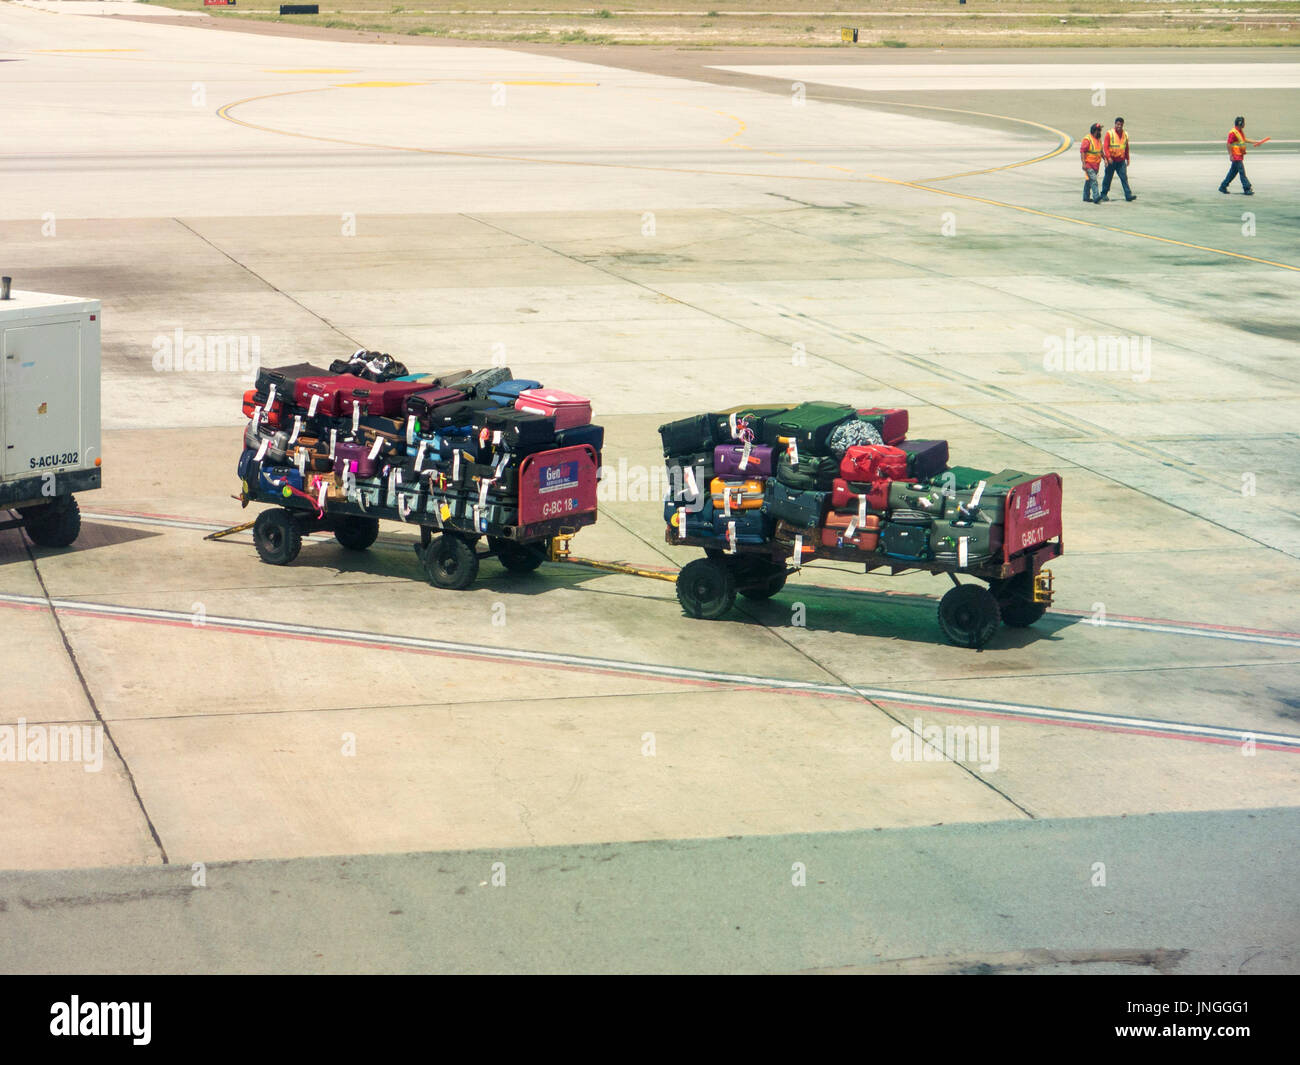 Baggage carts hold luggage at airport - Stock Image